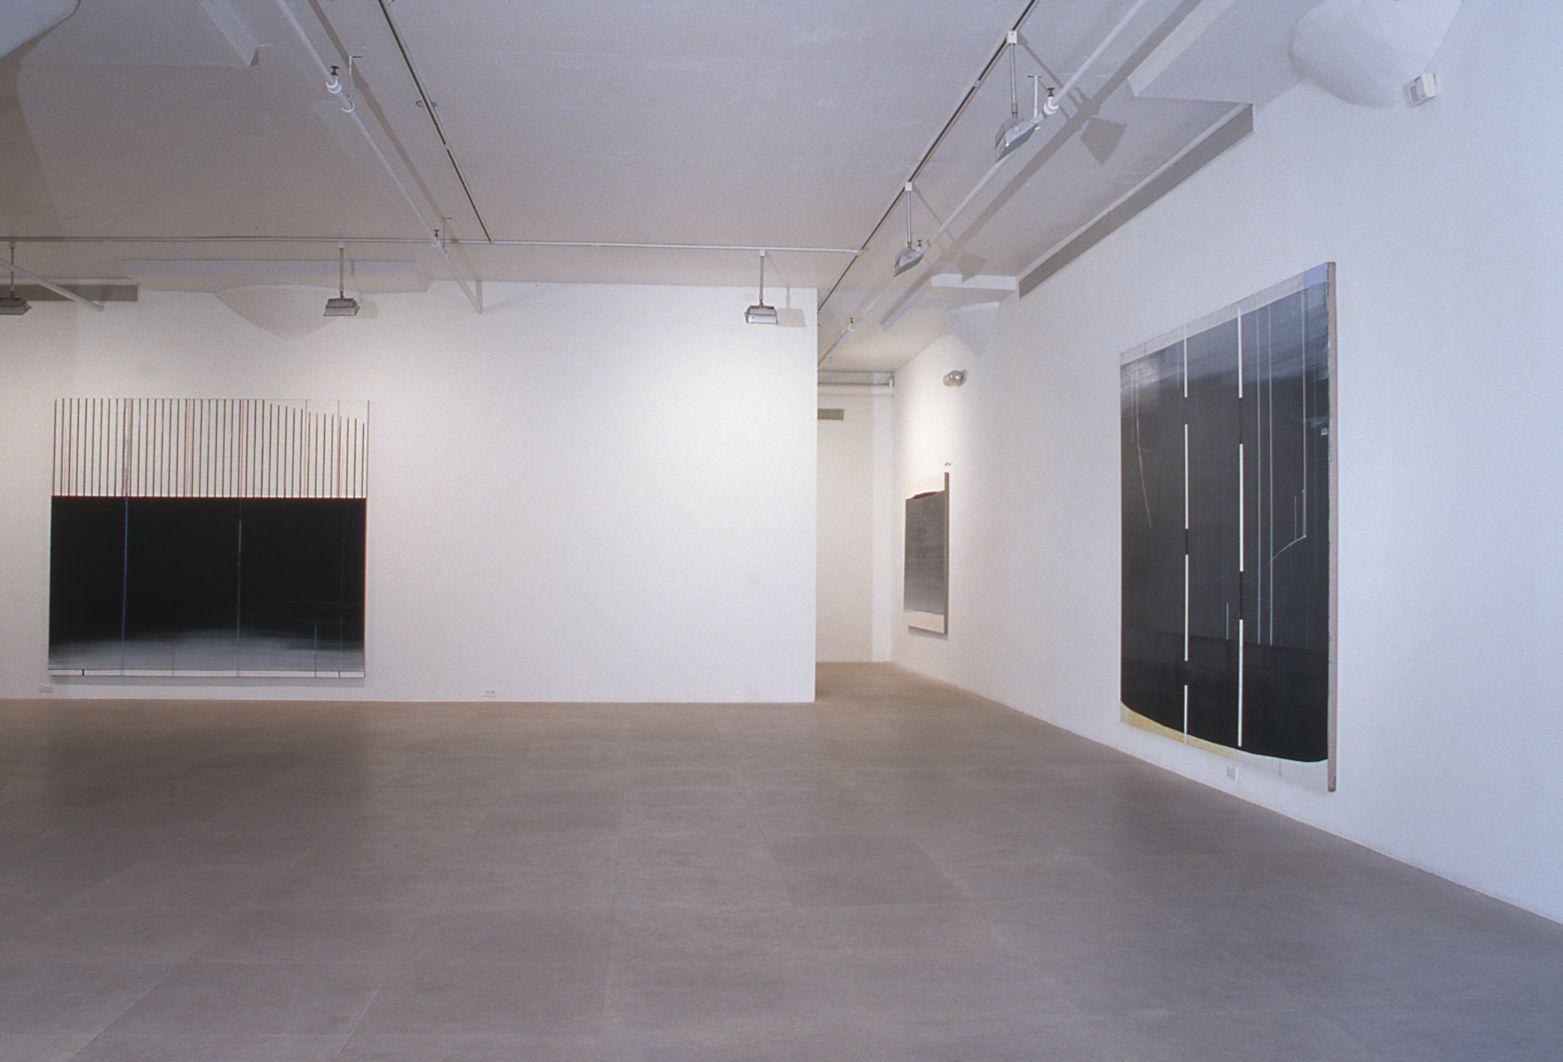 Installation view, Greene Naftali, New York, 1999